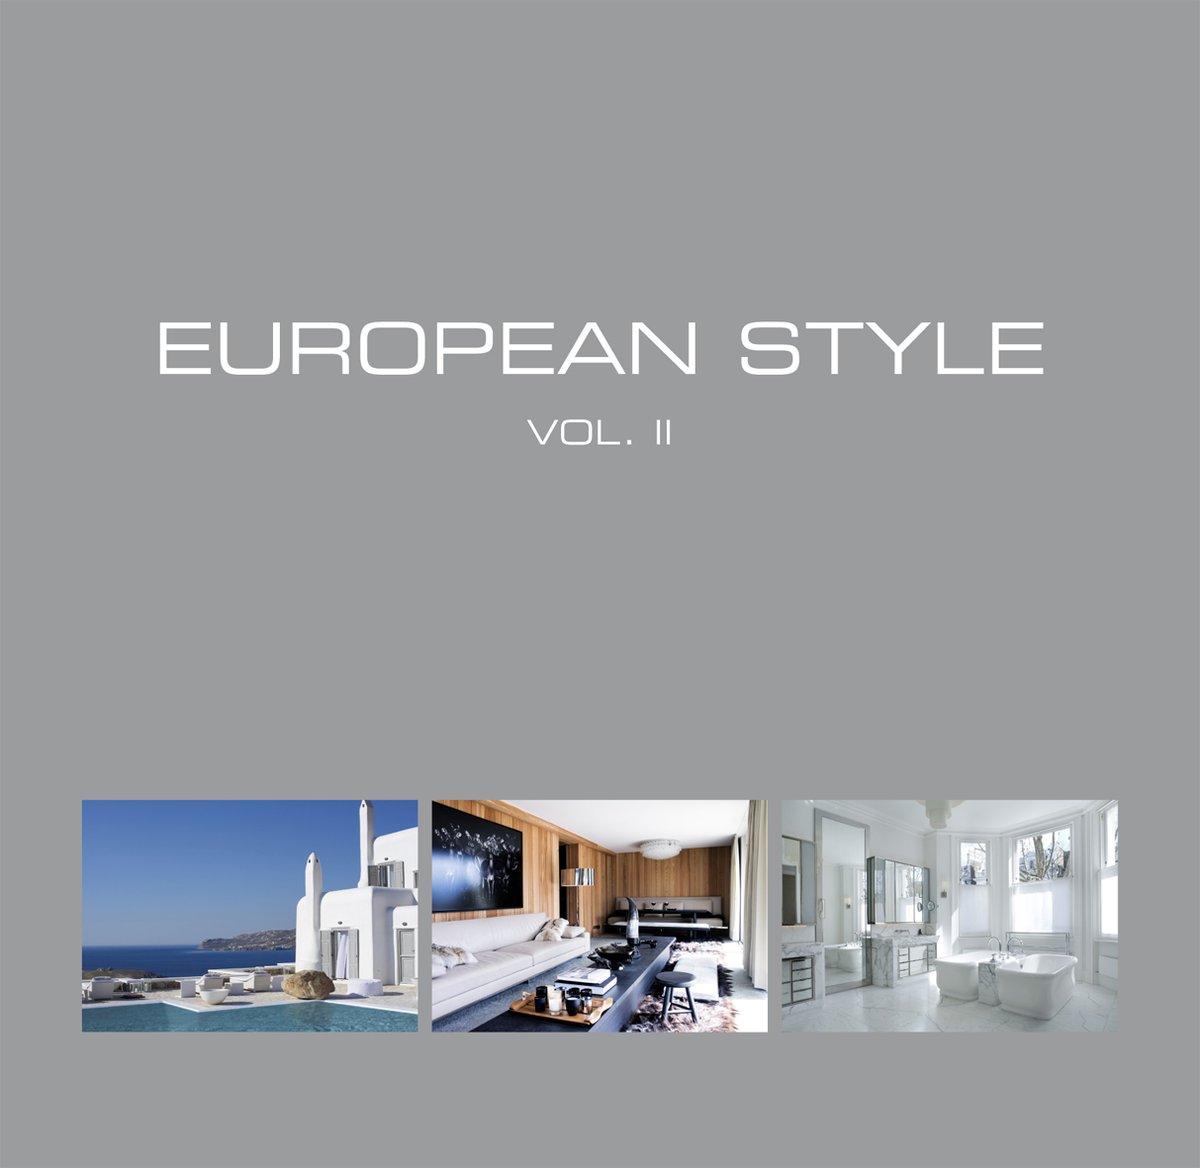 European Style Vol. II